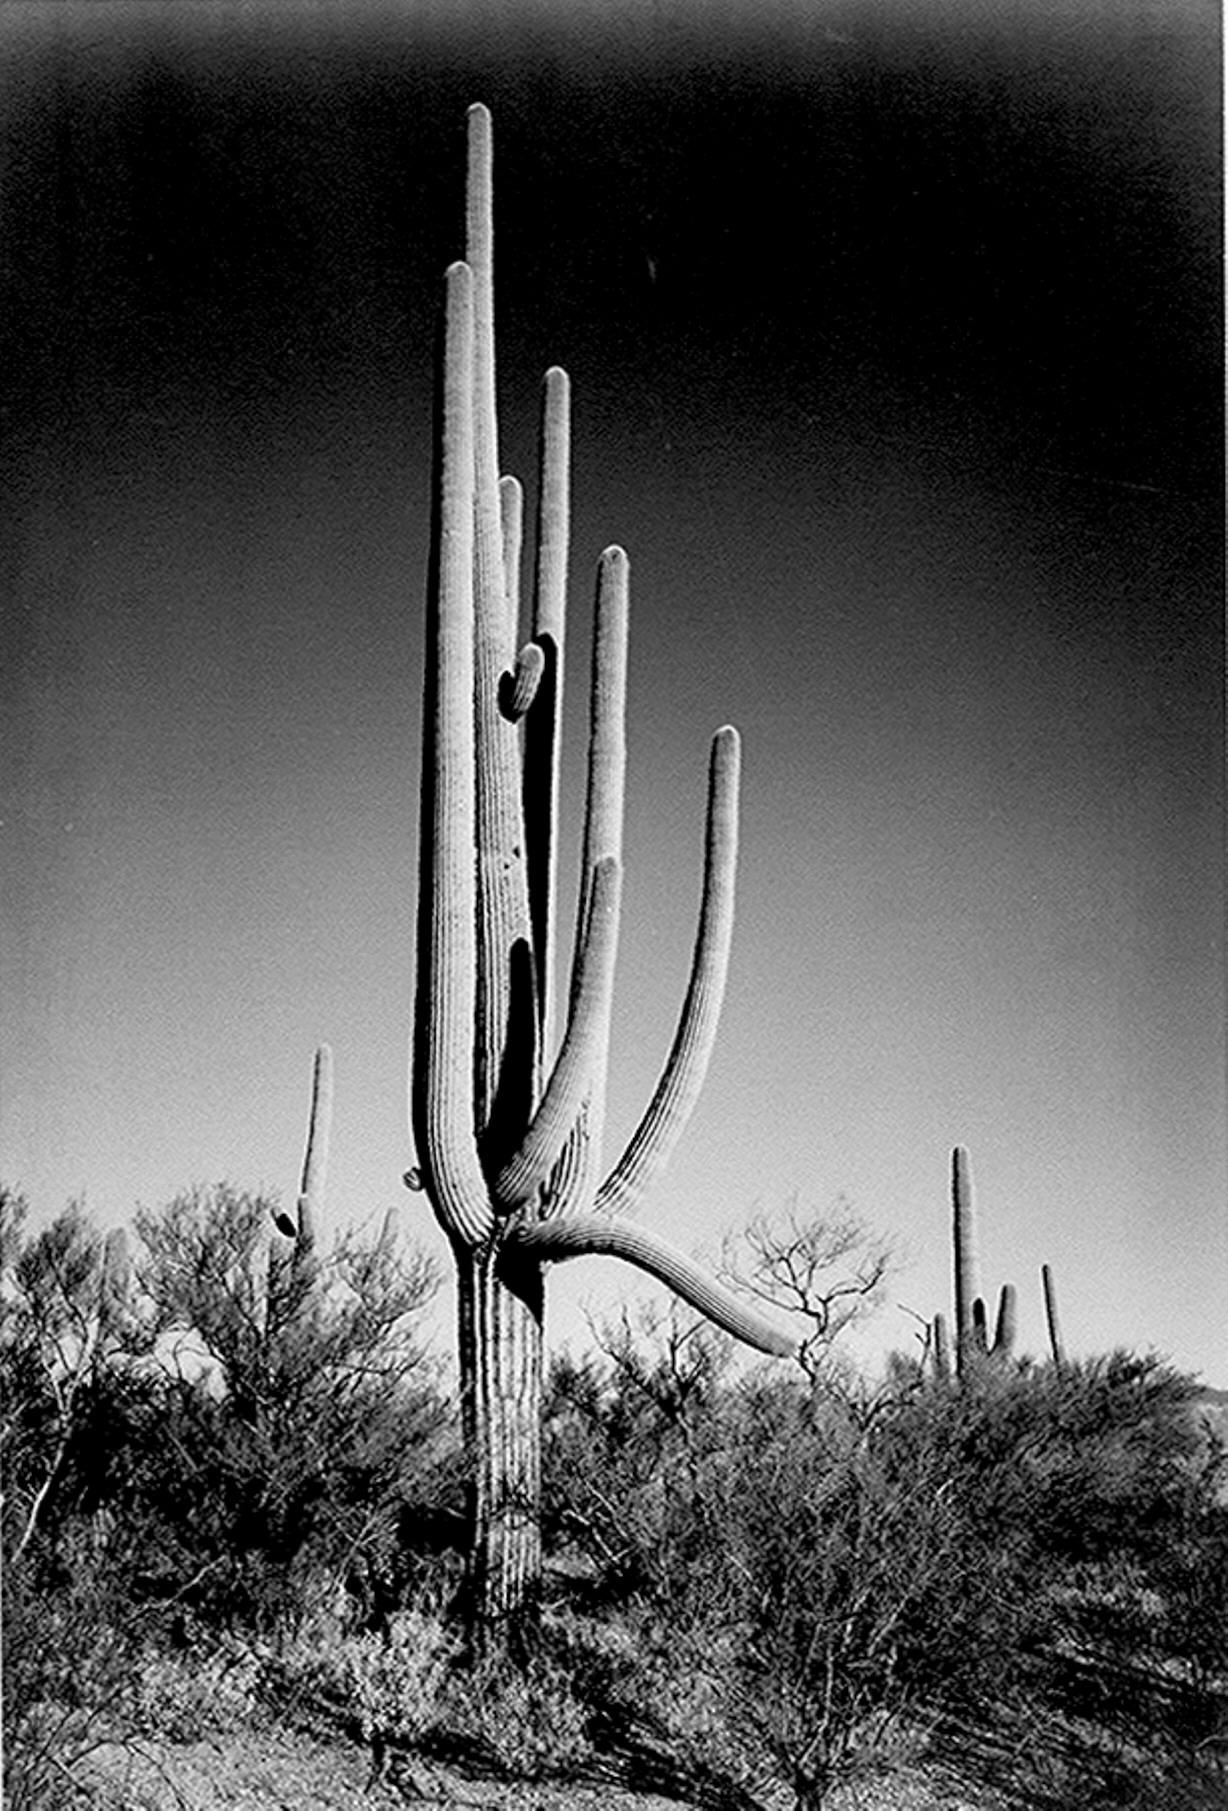 Ansel Adams' Saguaro Cactus